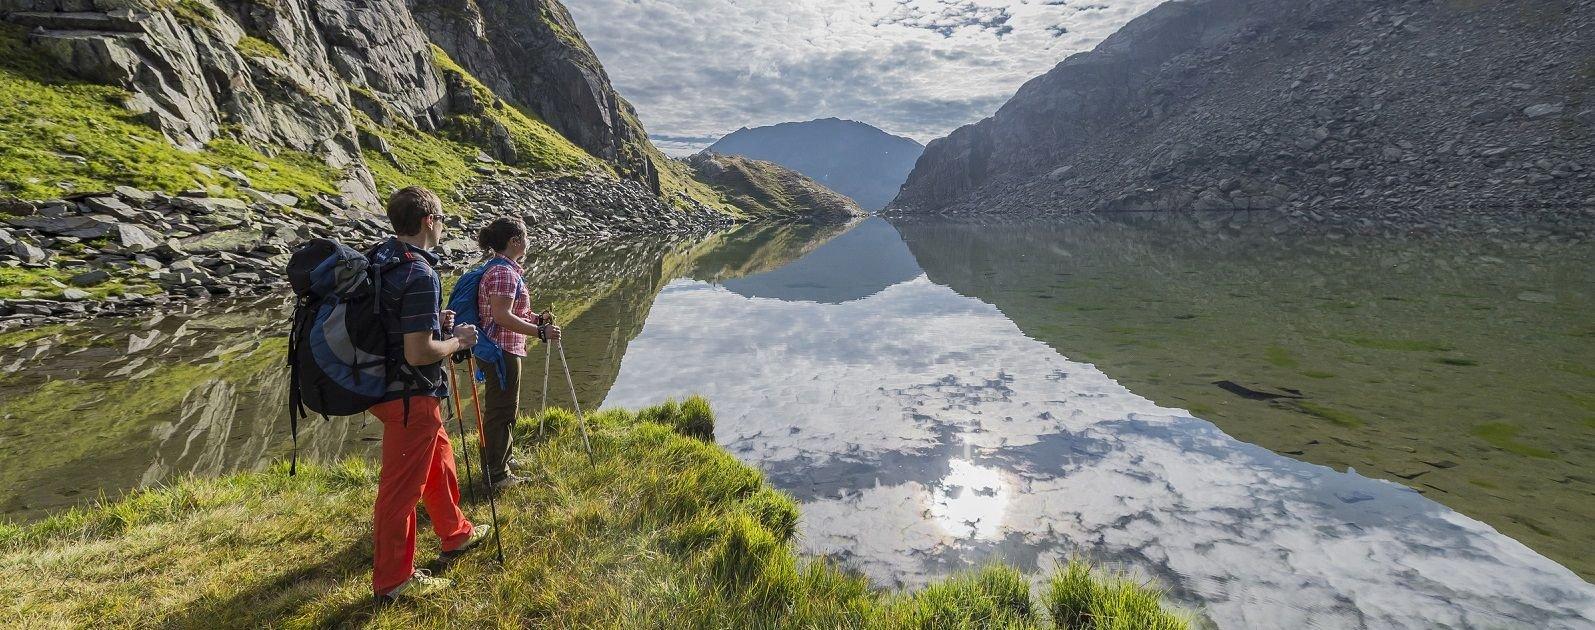 Wanderung Rheinquelle Disentis